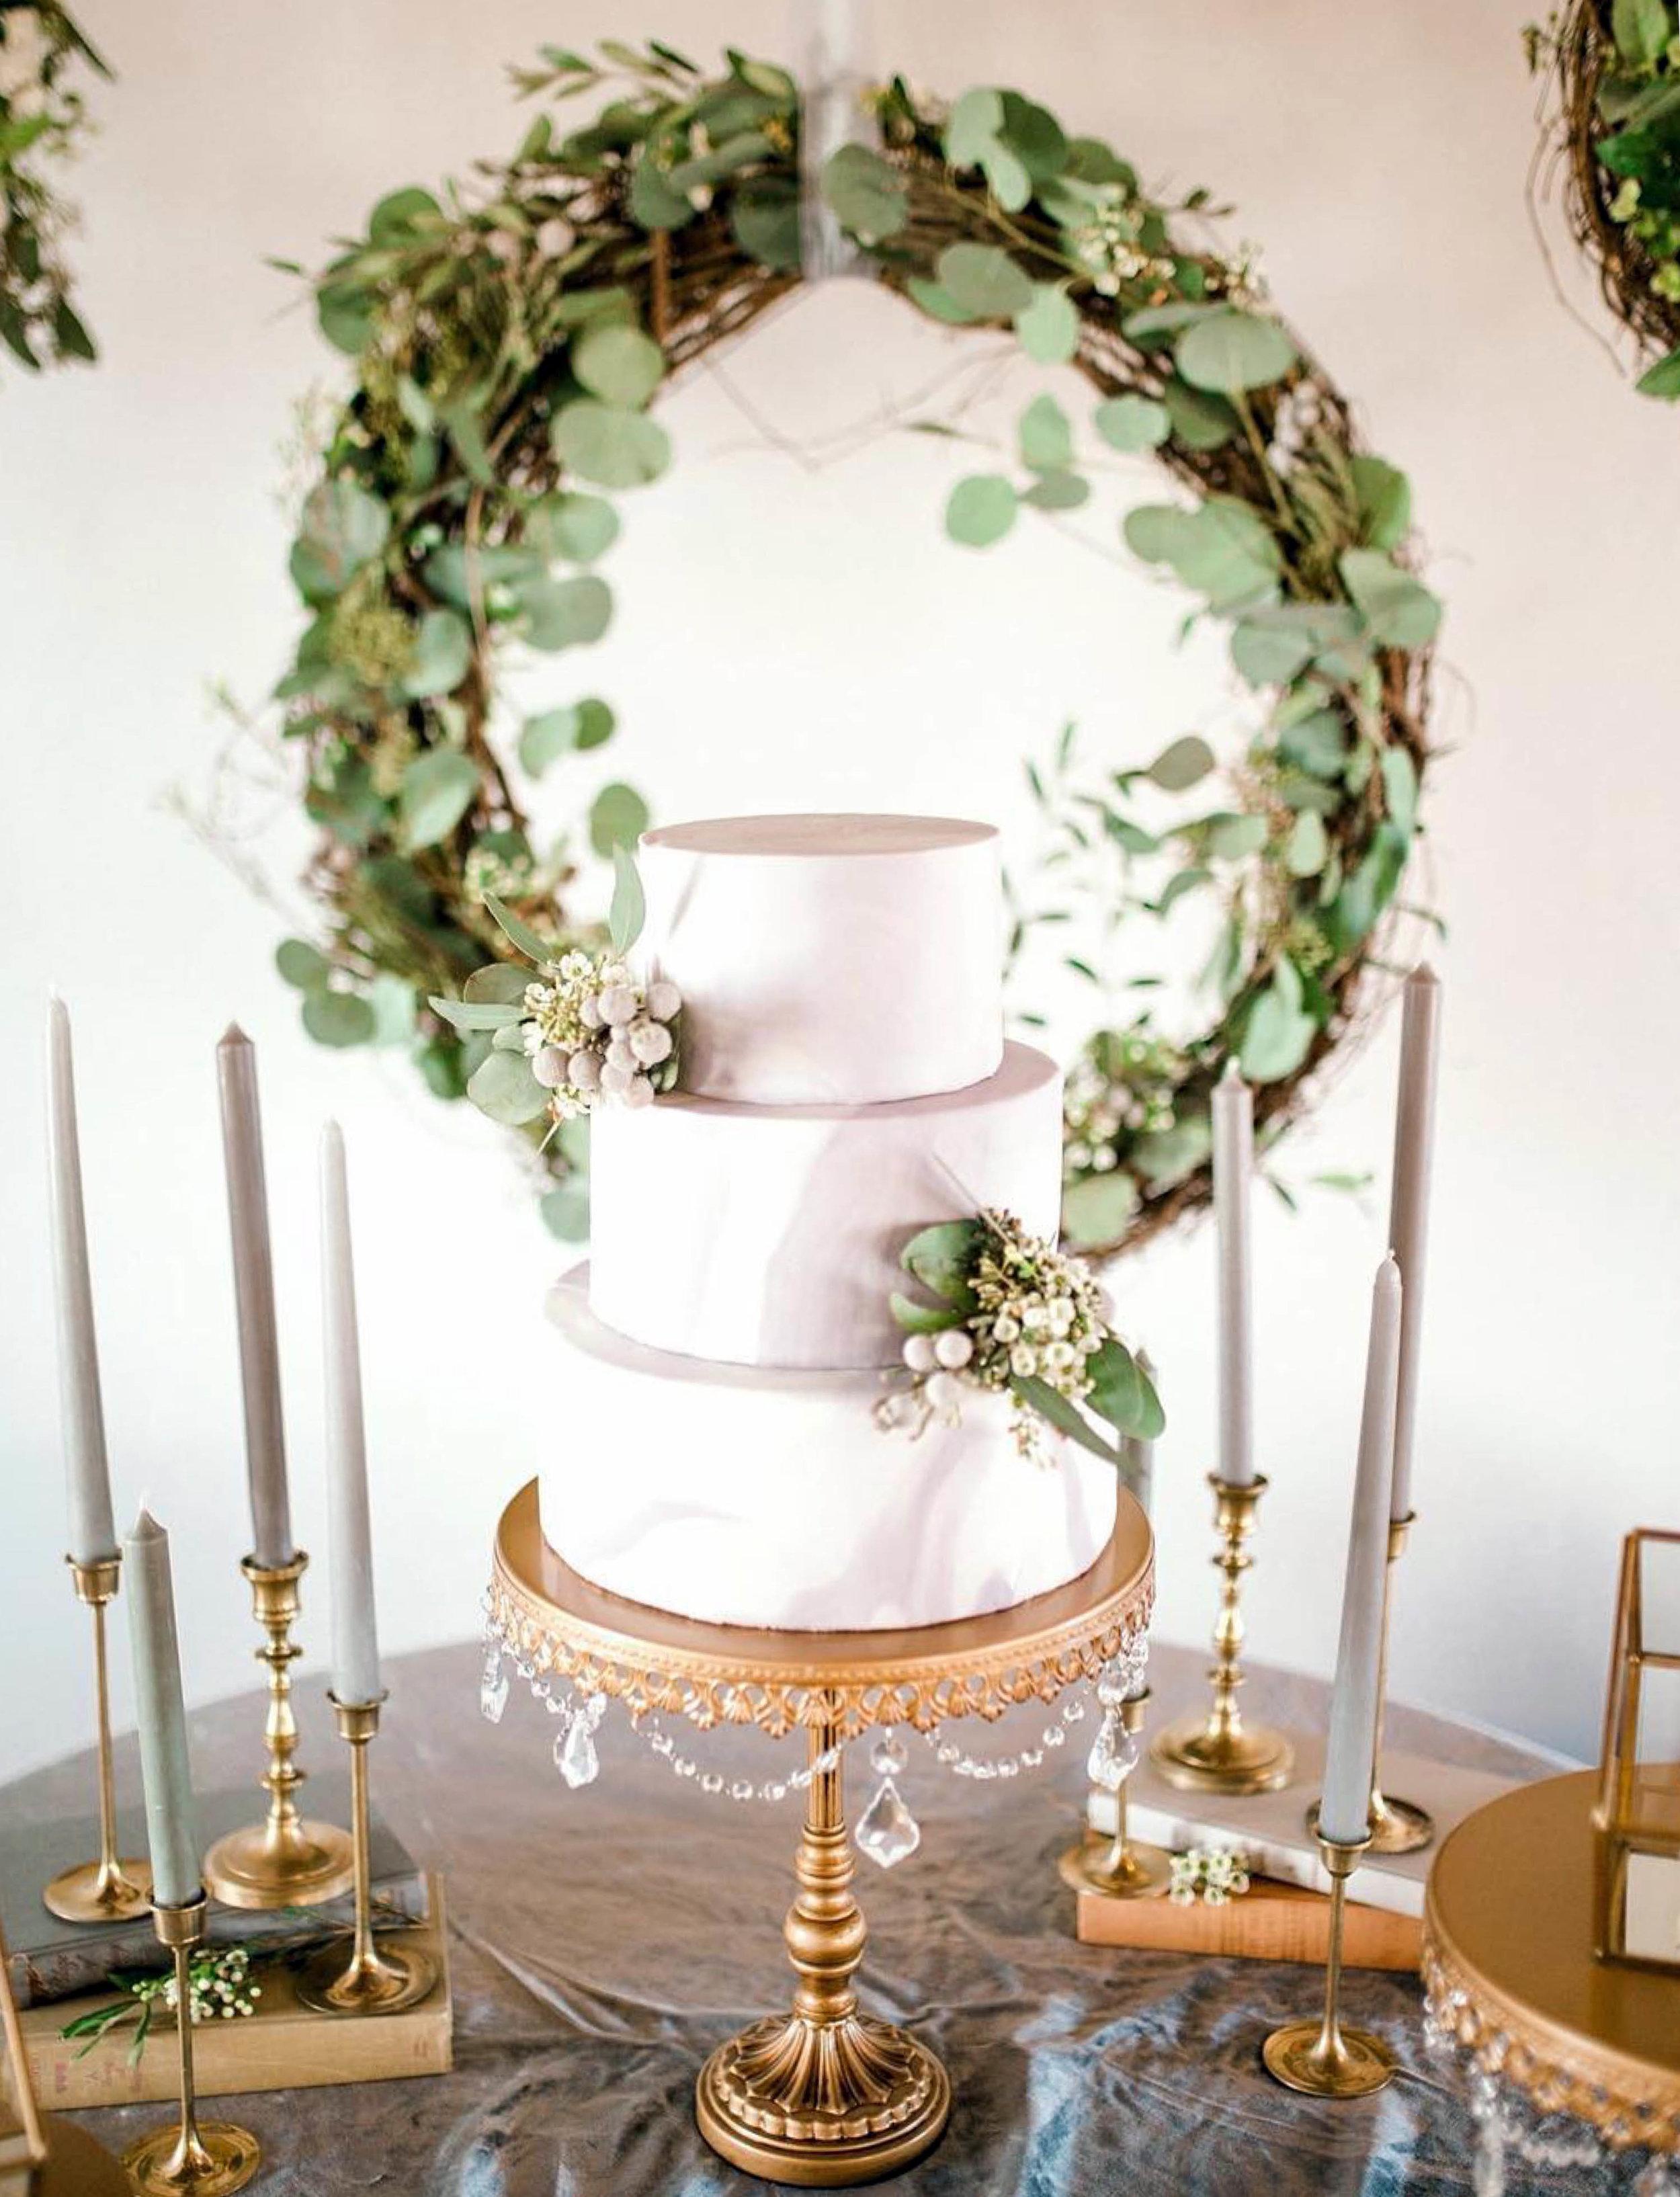 Opulent Treasures-1 Chandelier Cake Stand Antique Gold.jpg